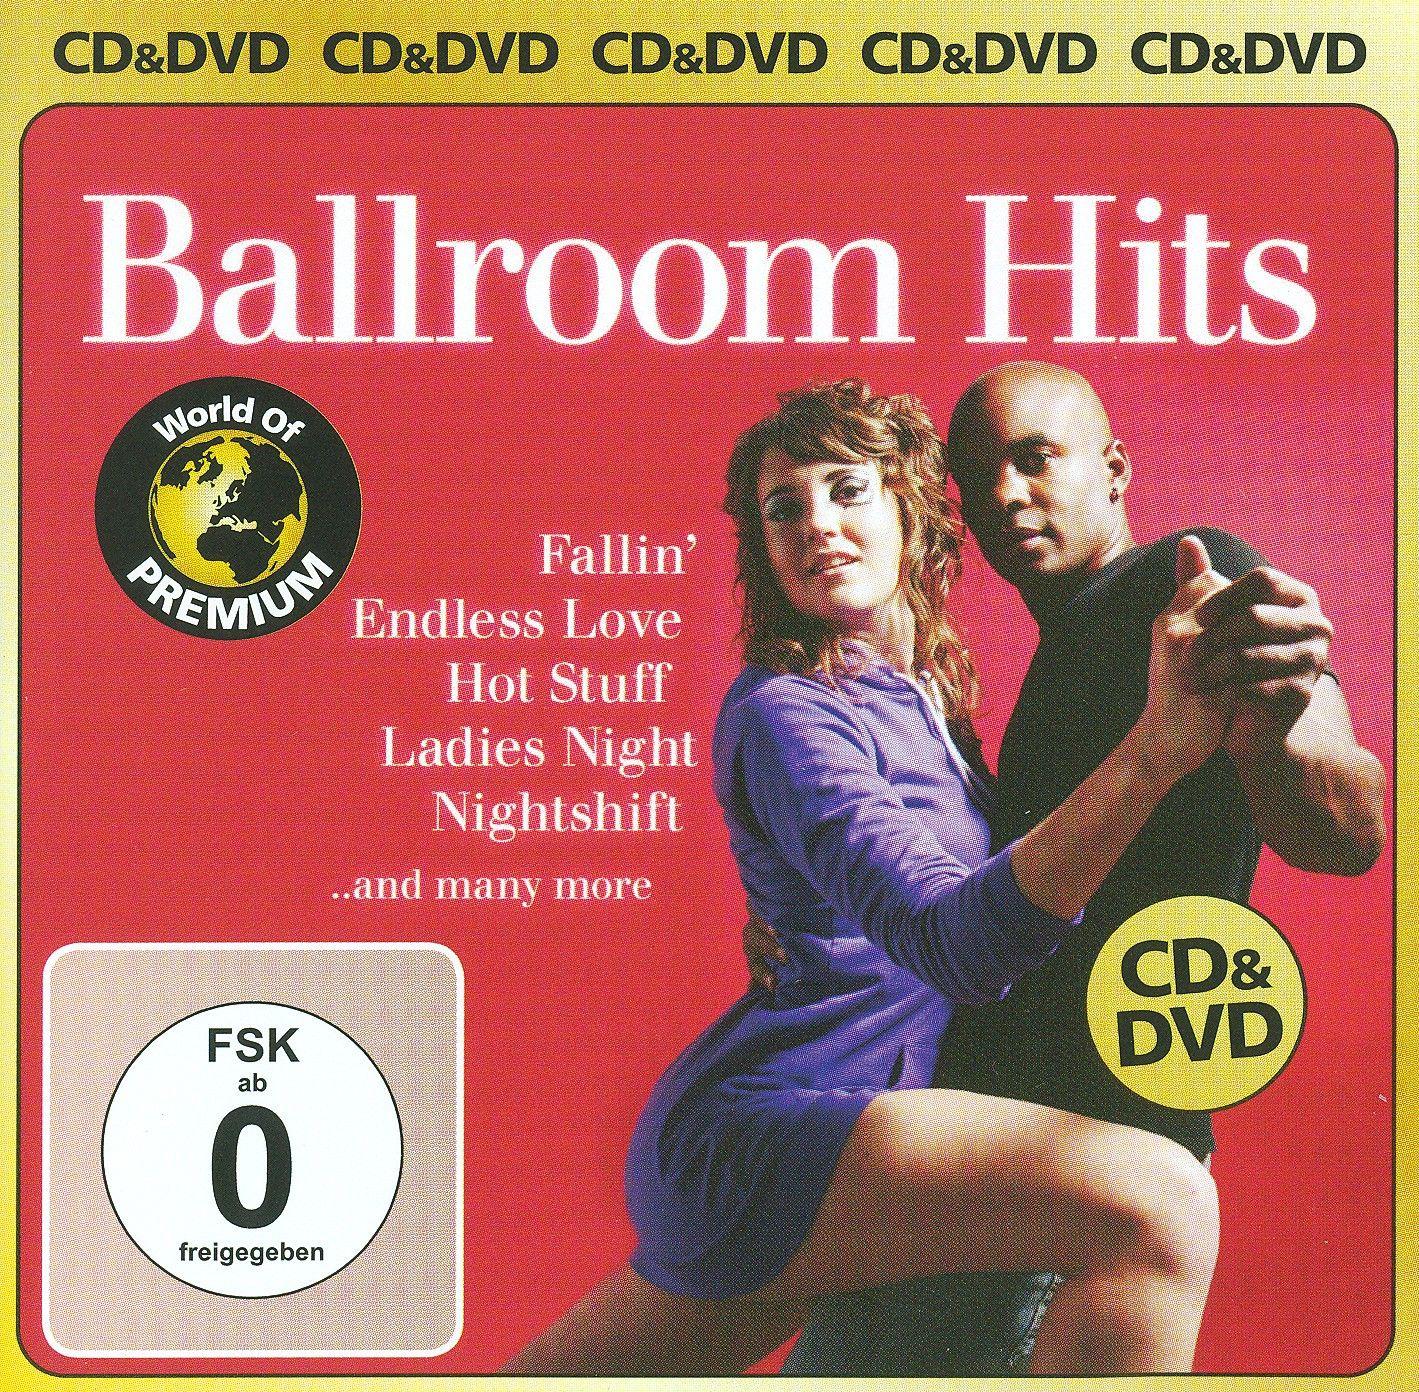 Ballroom Hits